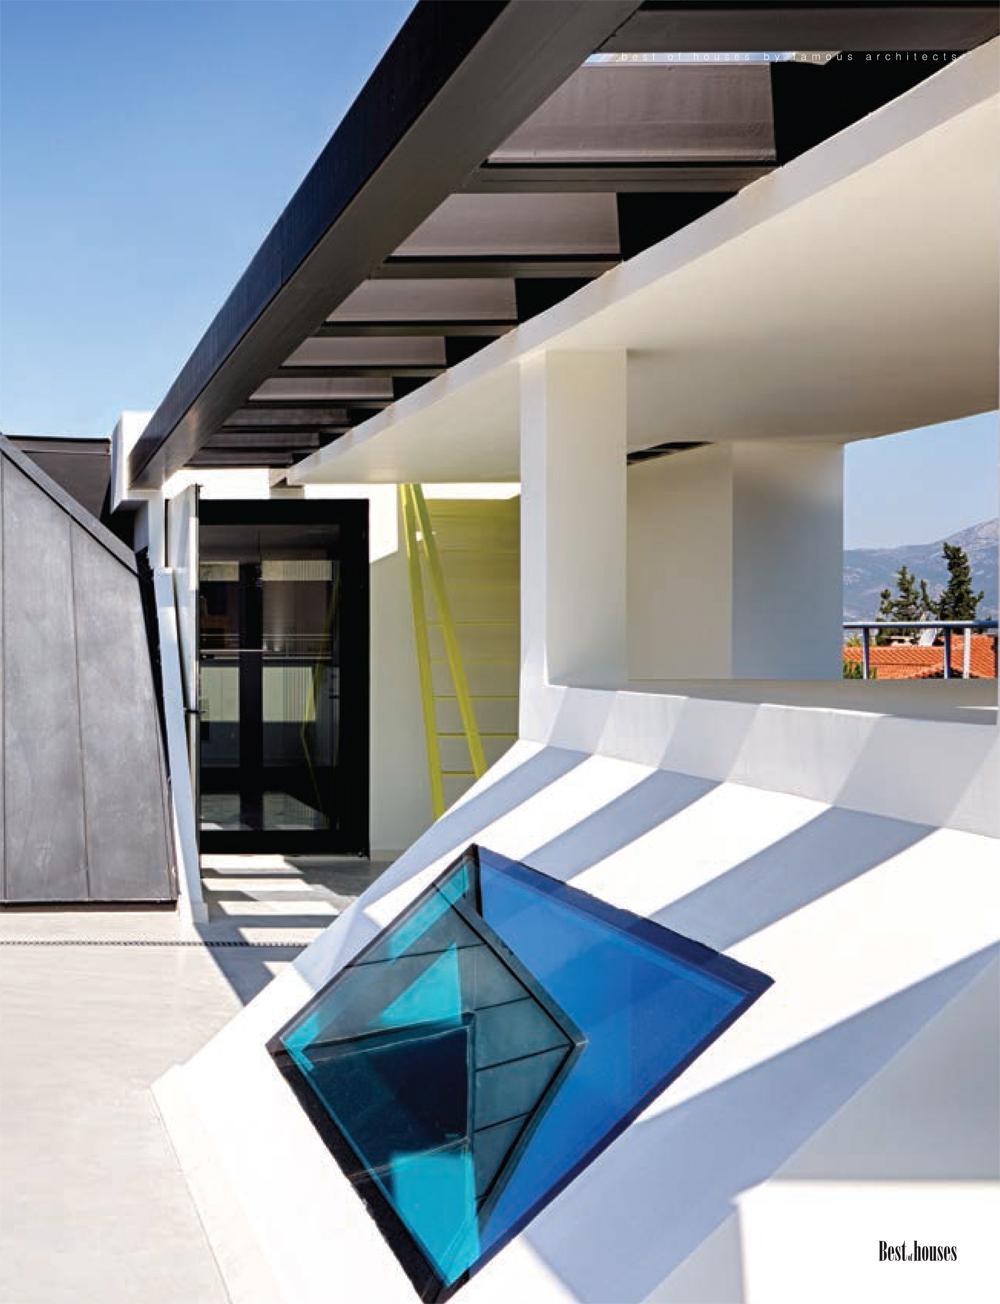 149_161_BoH_Dream_house-7.jpg